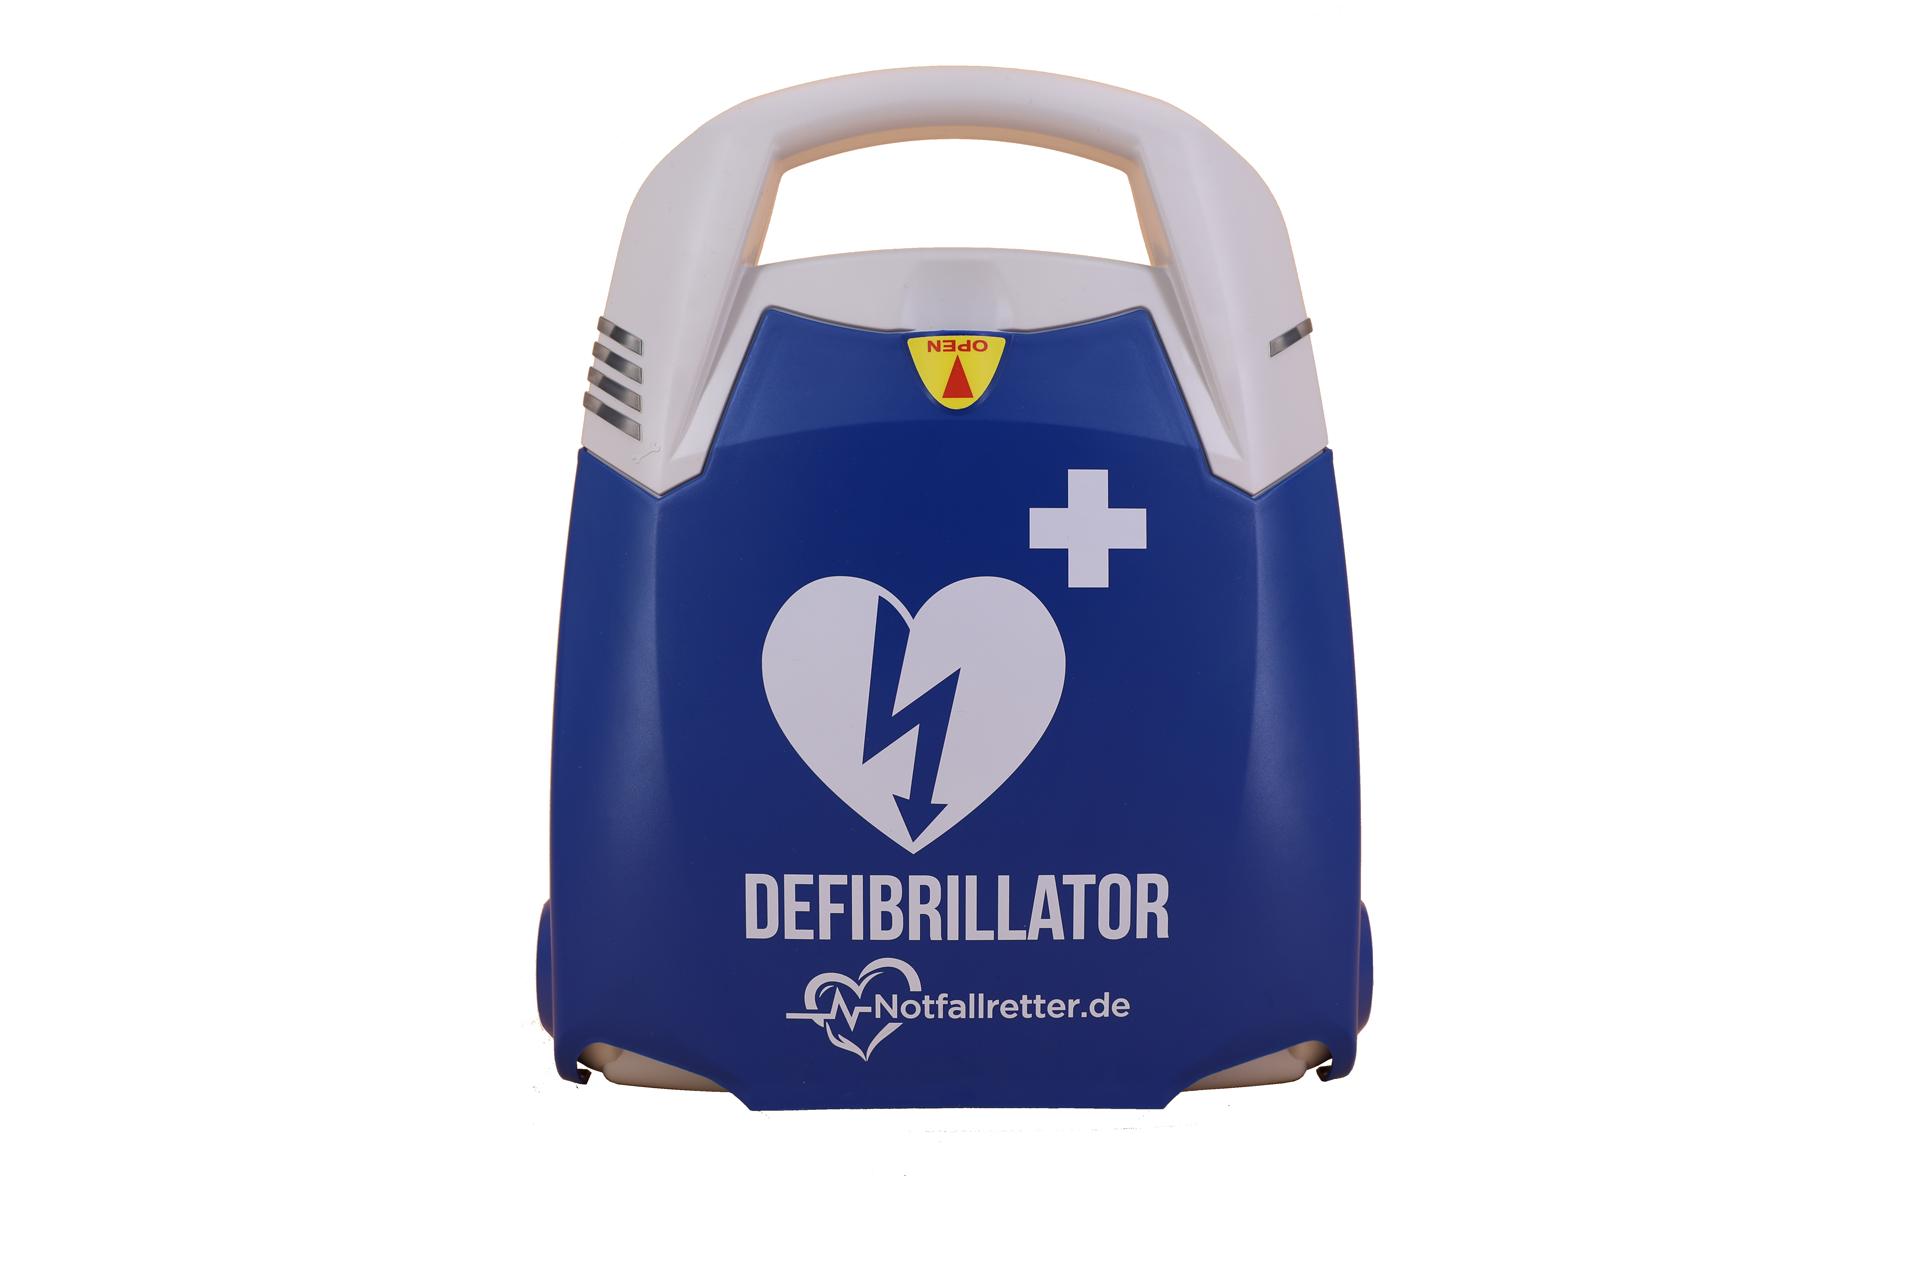 Notfallretter.de® Defibrillator TRAINER